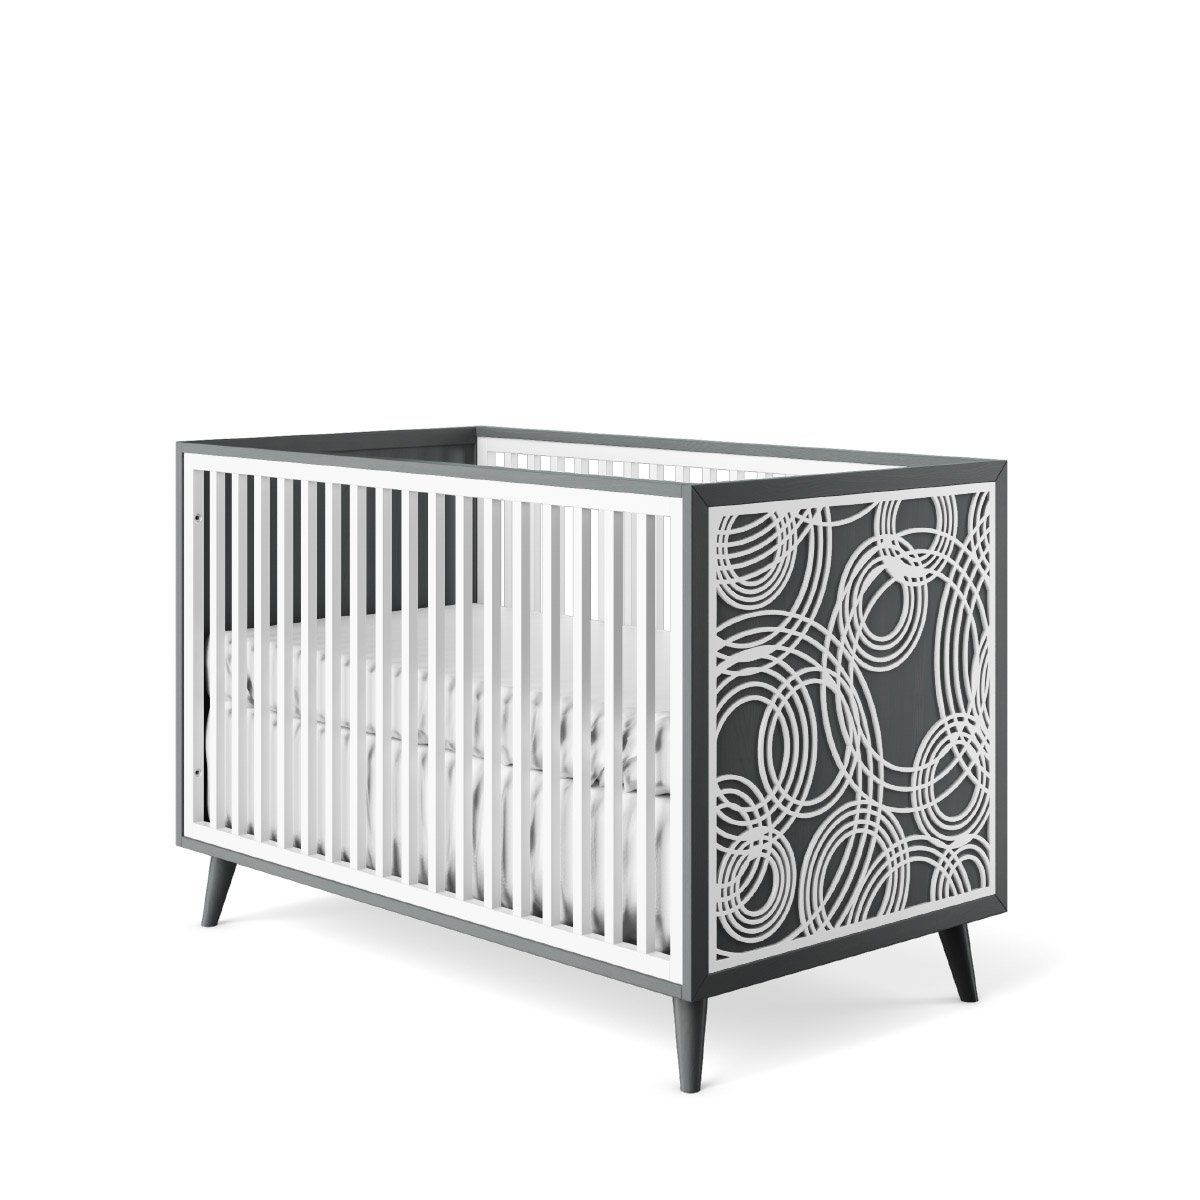 New York Crib In 2020 Cribs Small Sofa Furniture Care